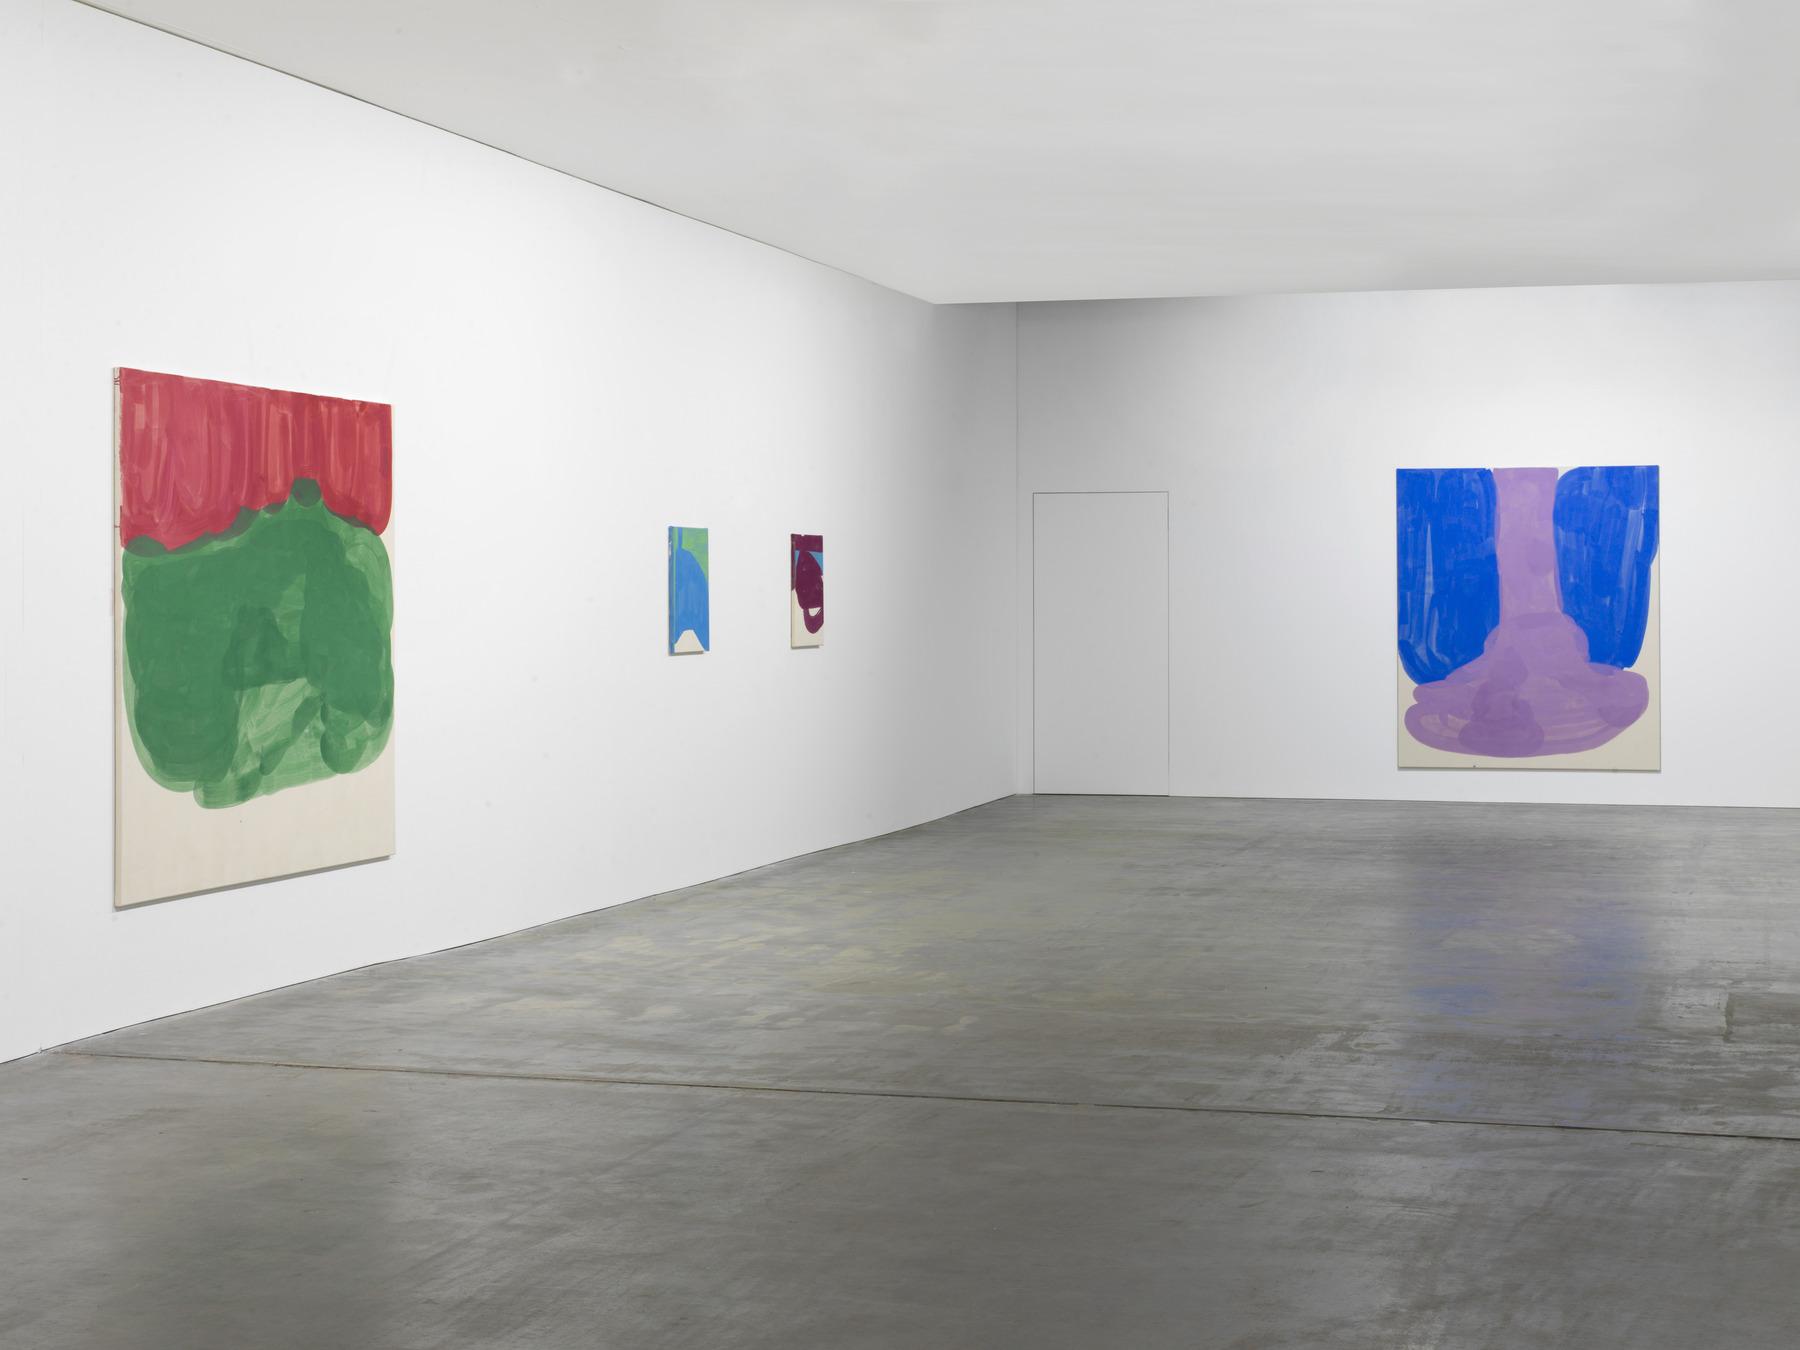 Tamina Amadyar_10,000 hours_Galerie Guido W. Baudach, Berlin_01